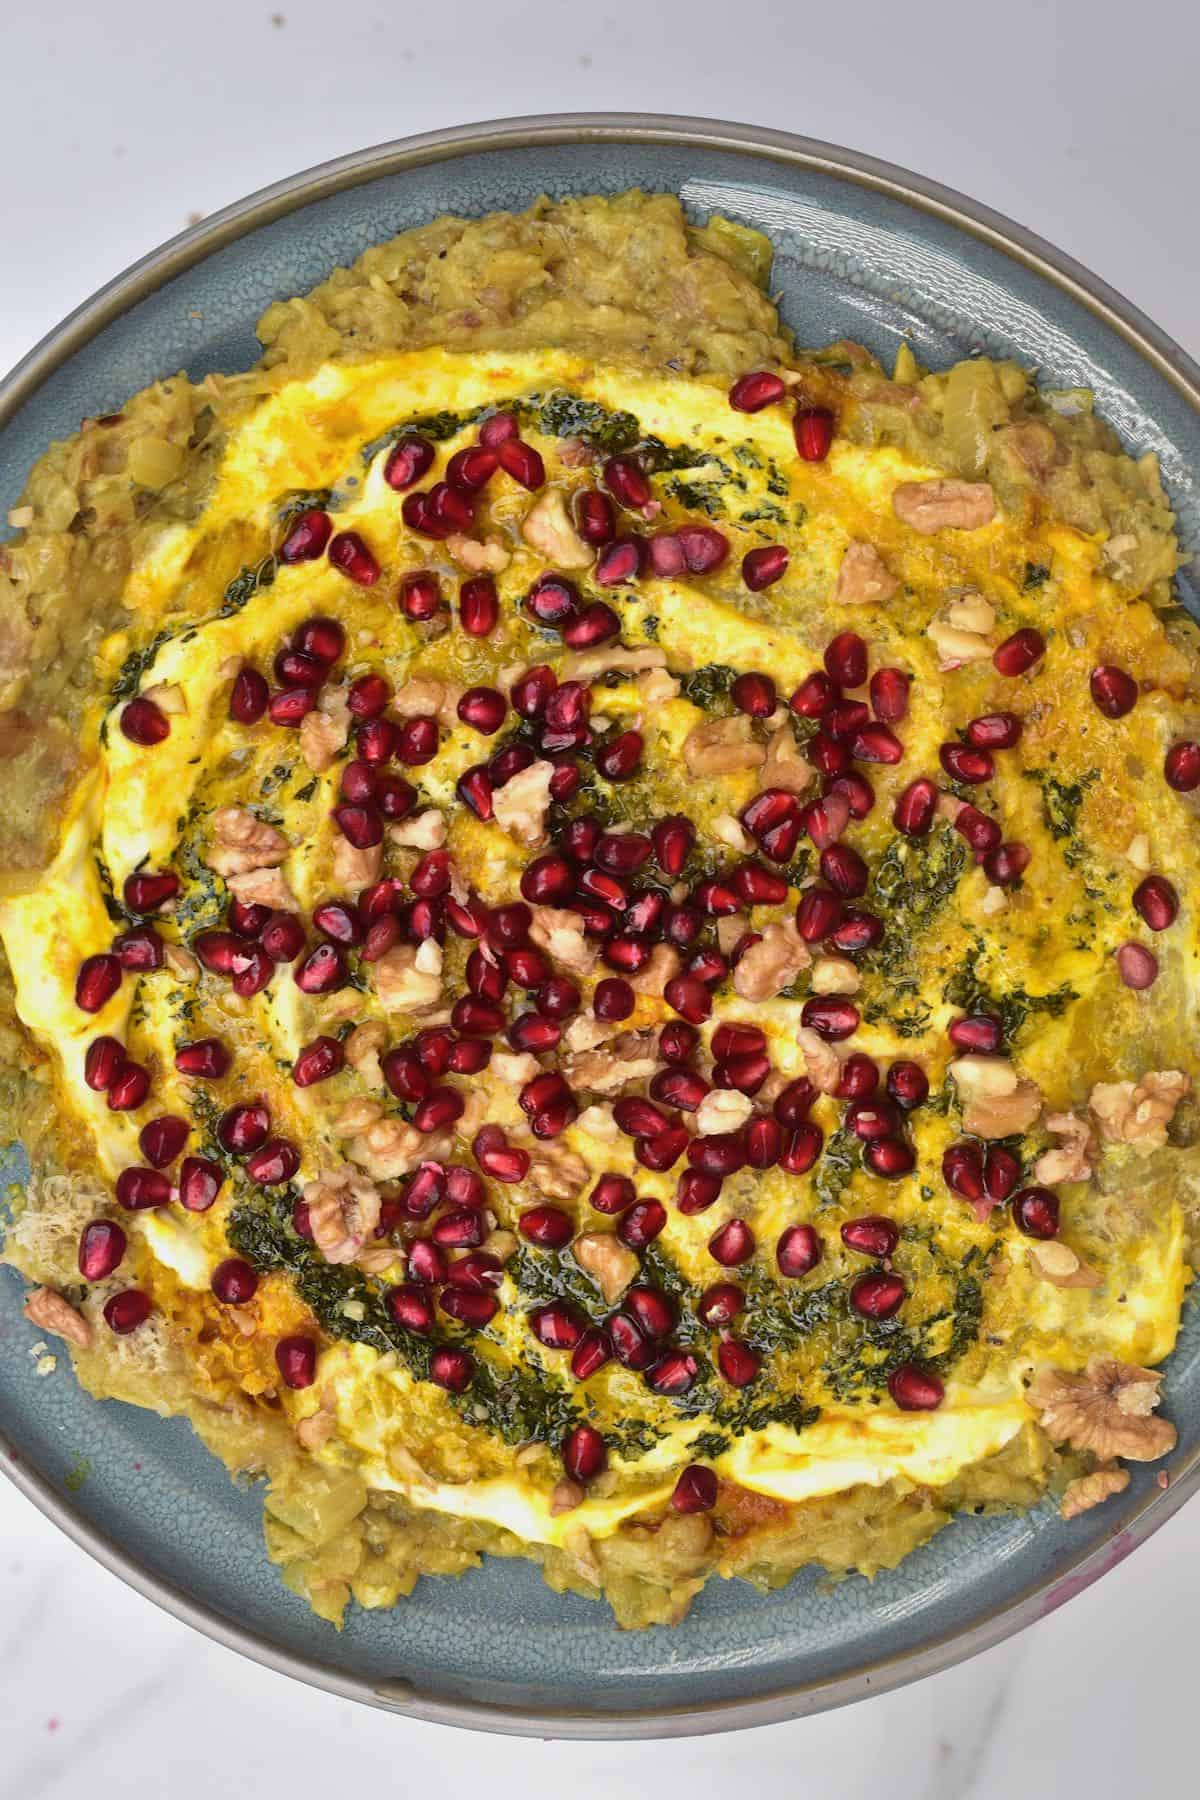 Kashke bademjan topped with pomegranate seeds